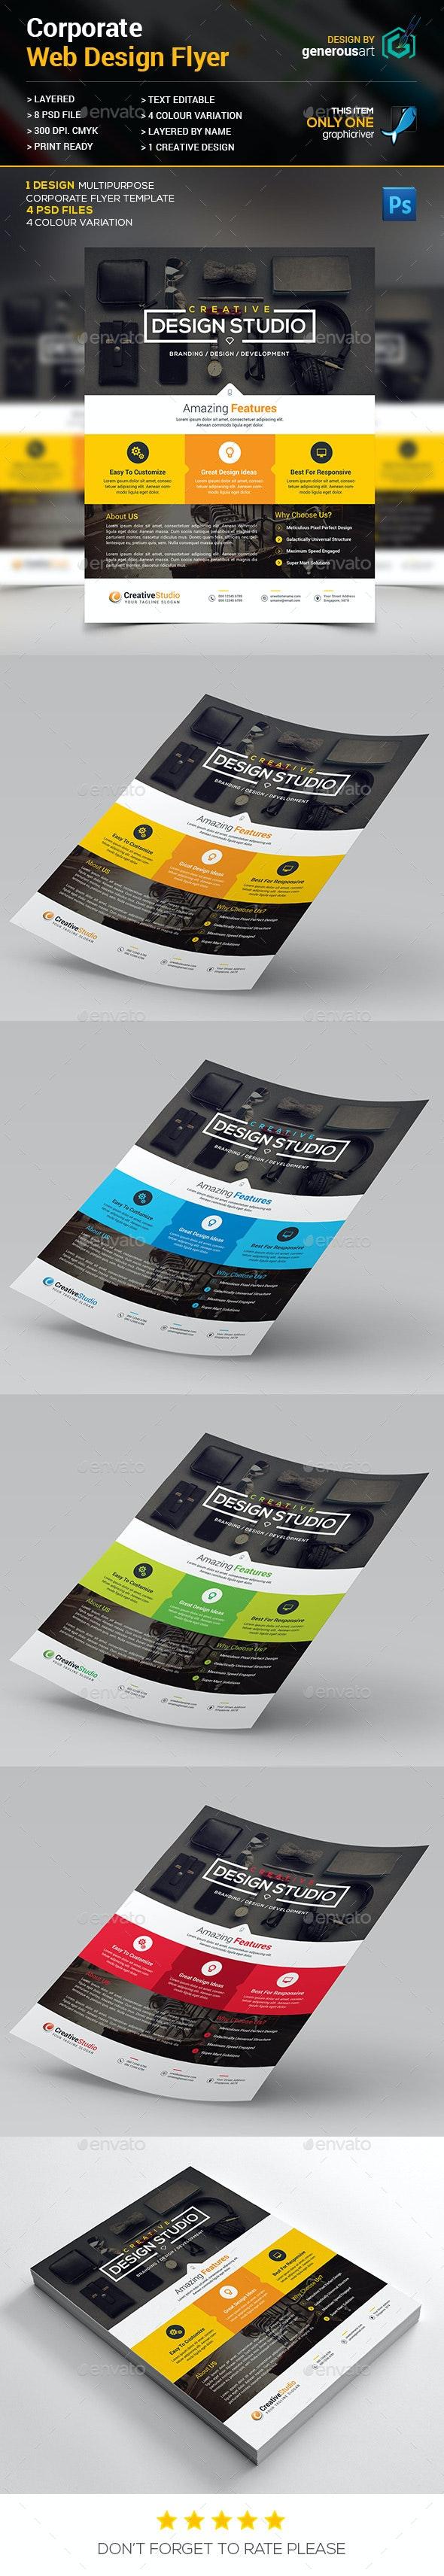 Web Design Flyer - Corporate Flyers